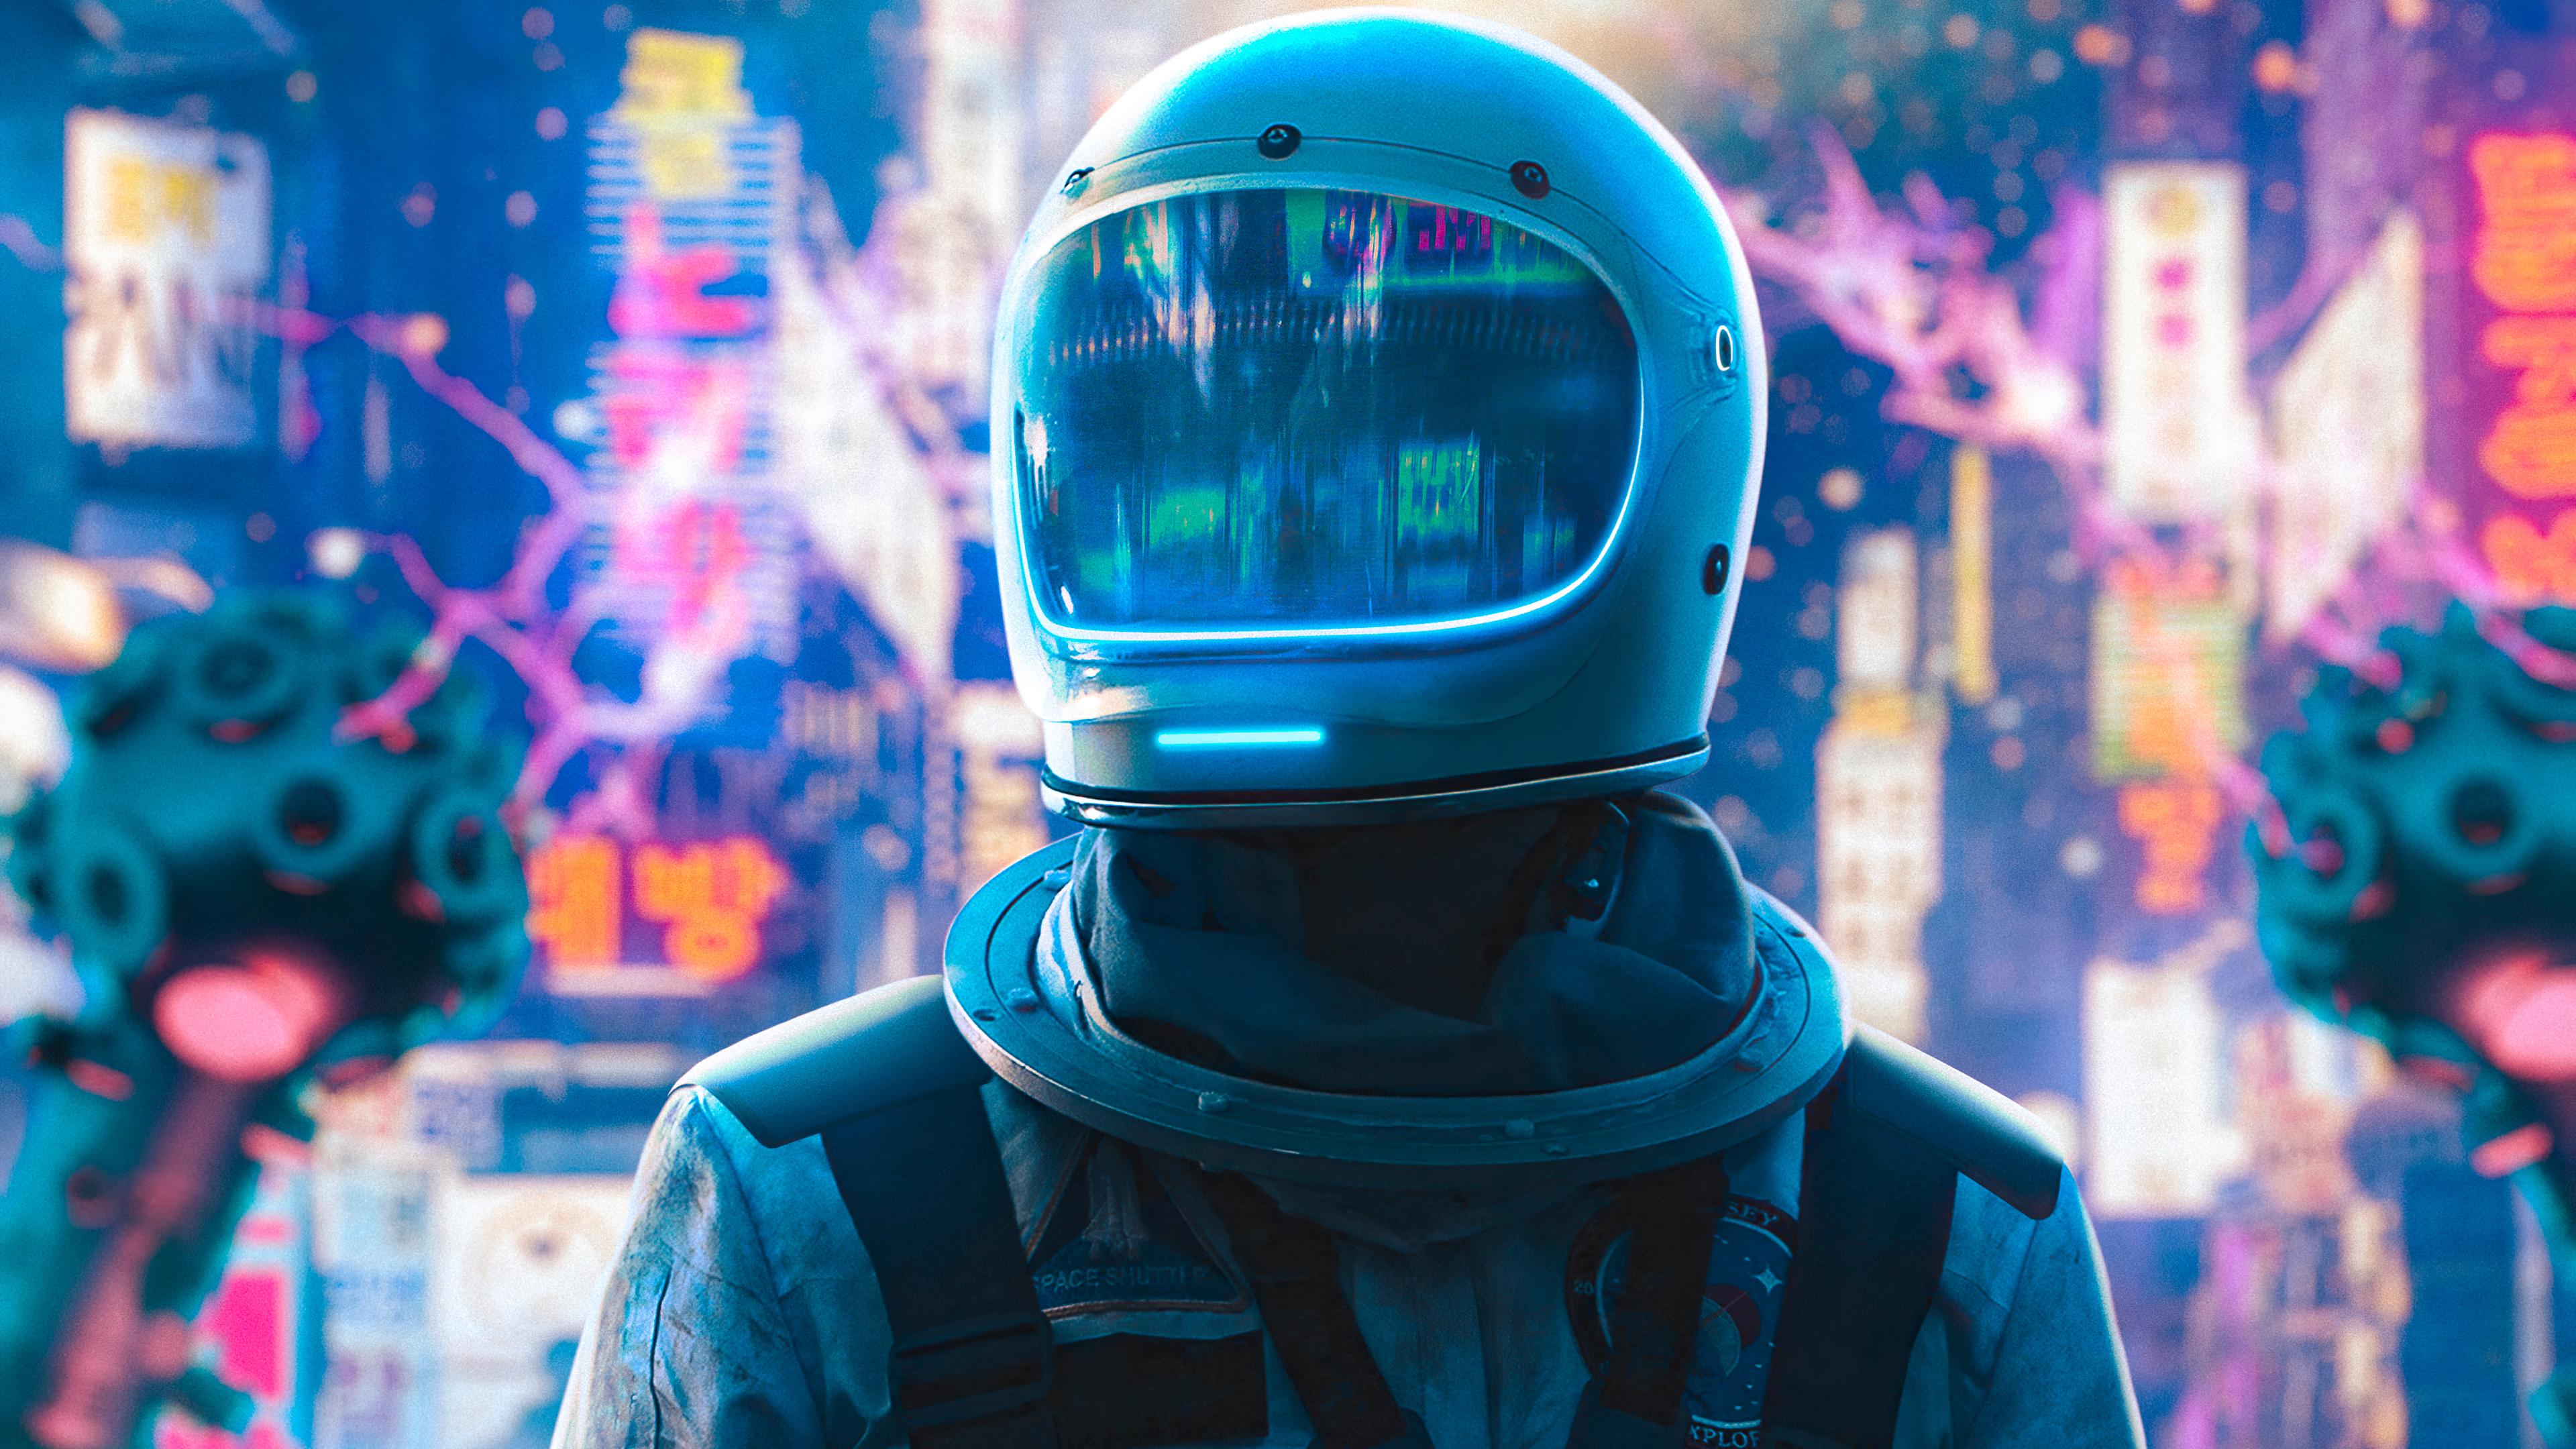 Astronaut 4k Ultra Hd Wallpaper Background Image 3840x2160 Id 1066405 Wallpaper Abyss